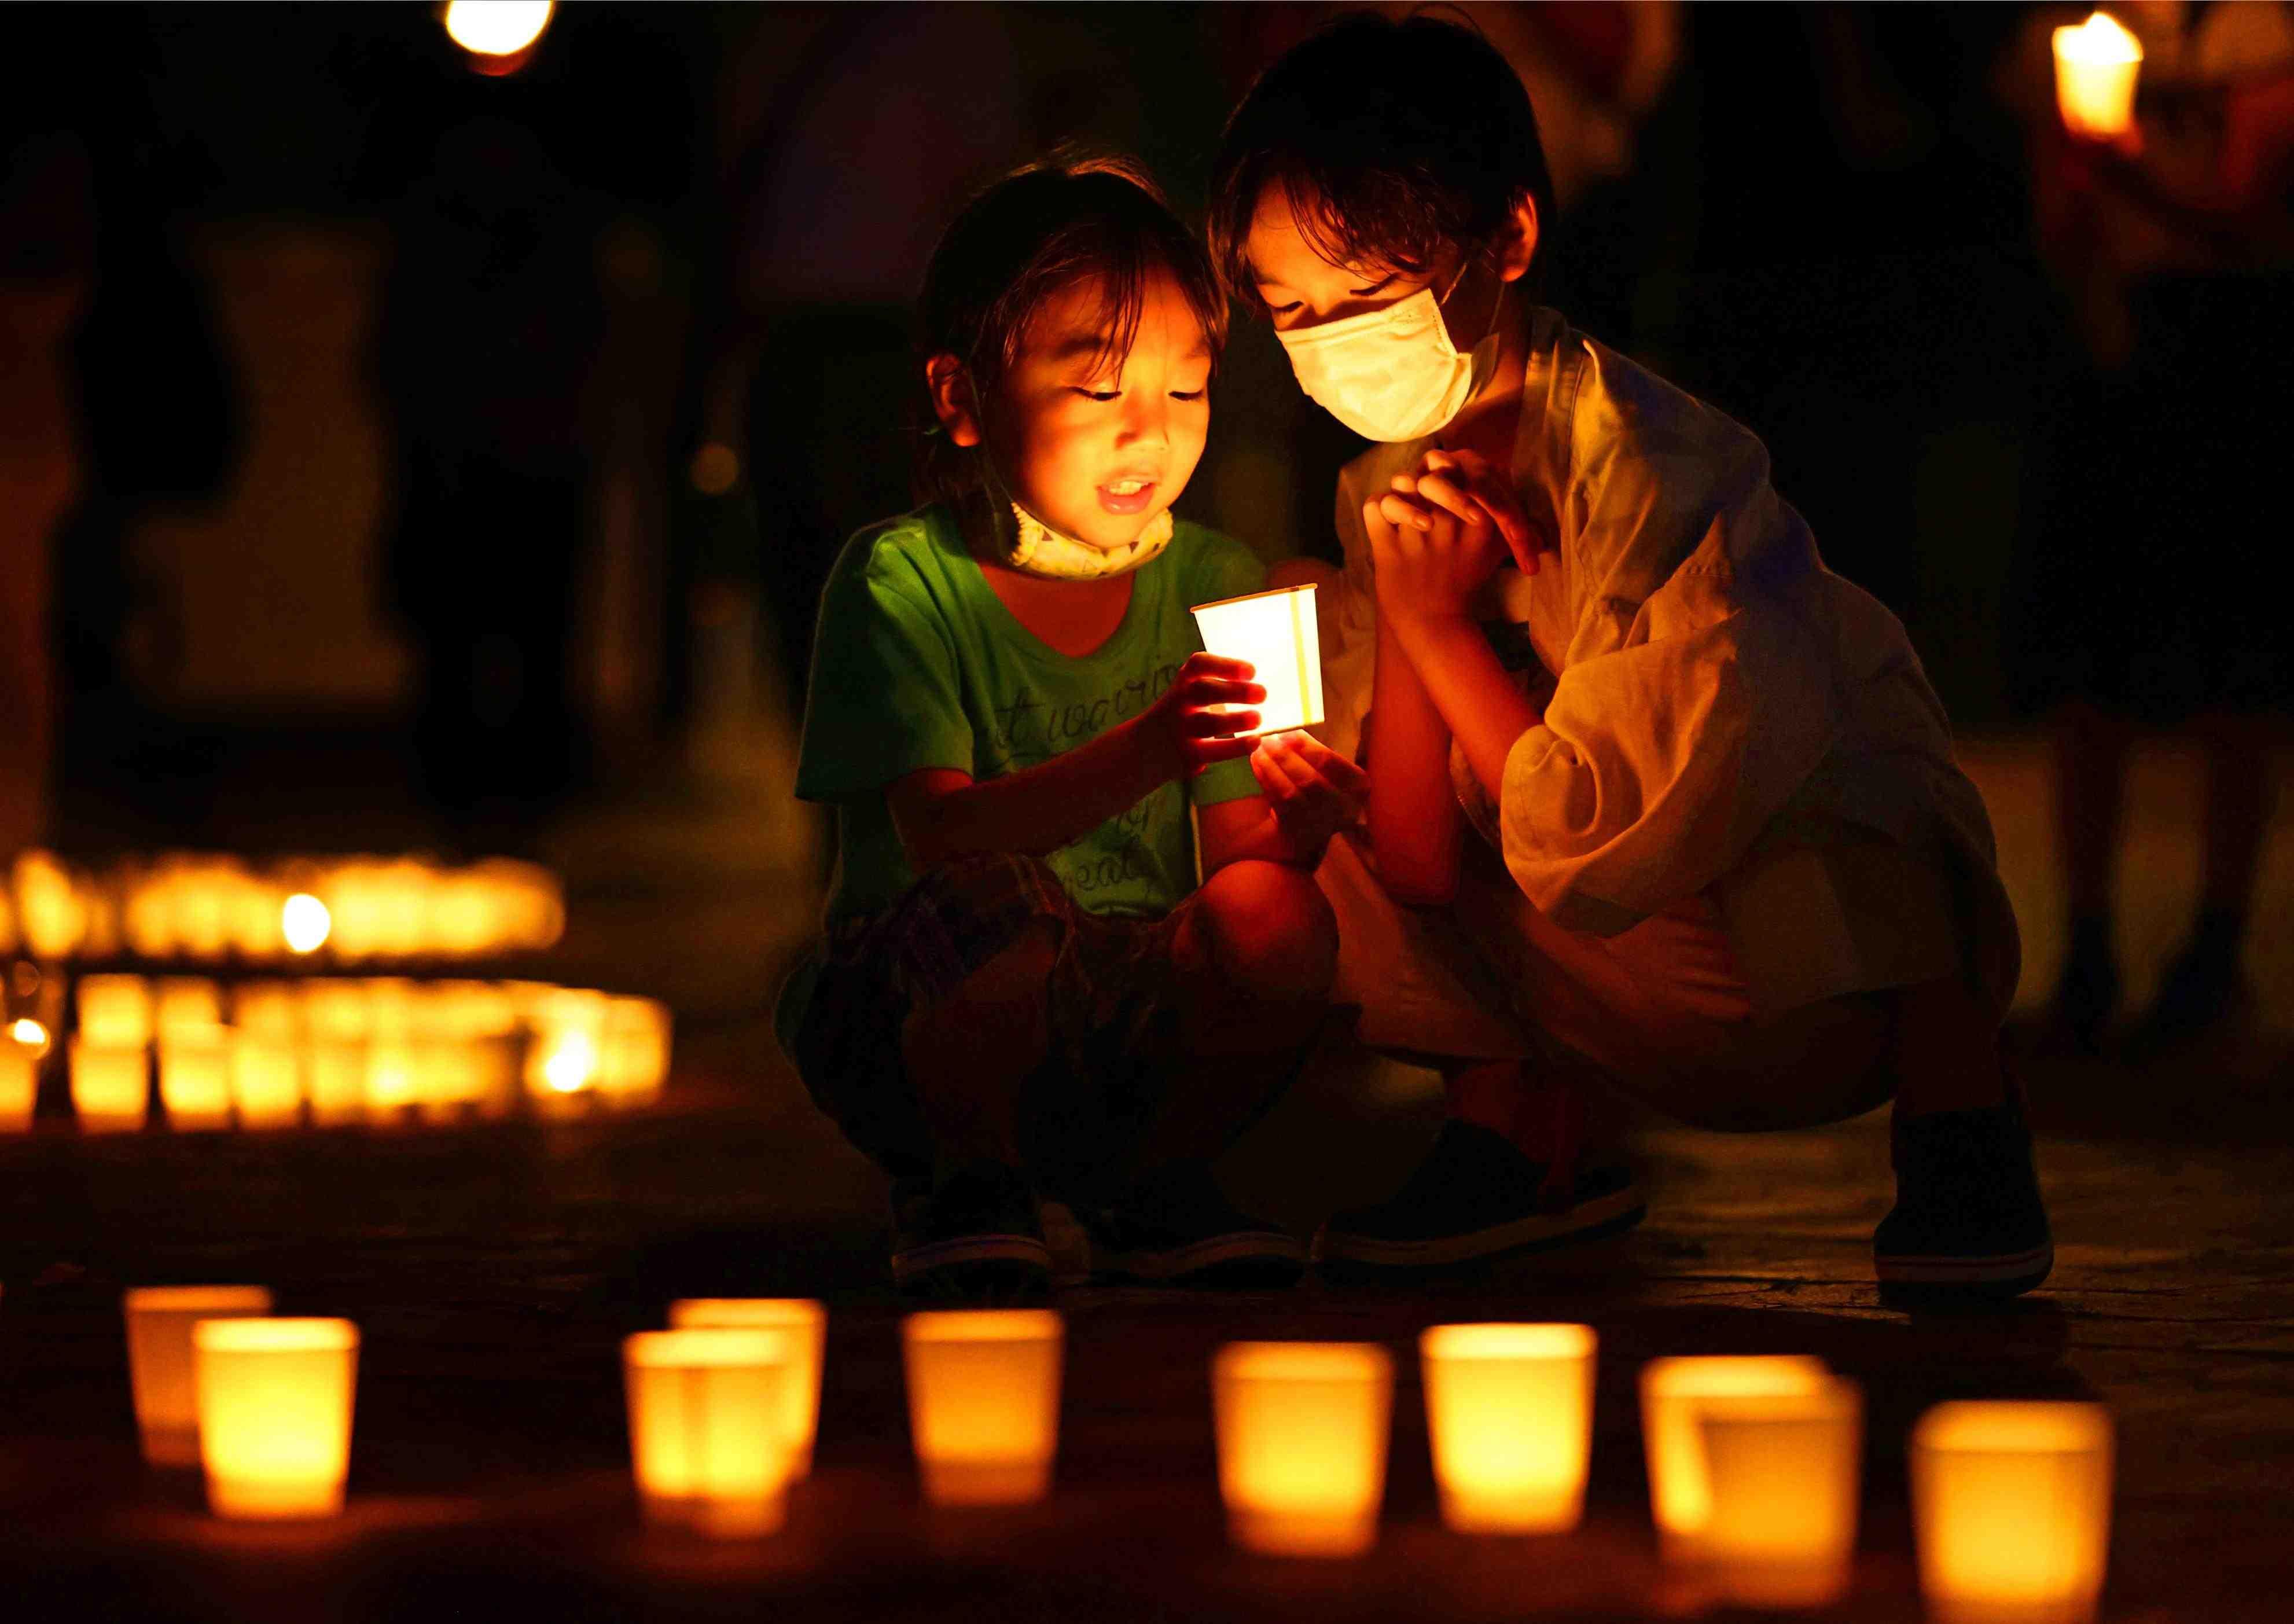 75 Years World War End Diary of Nagasaki A-Bomb 007